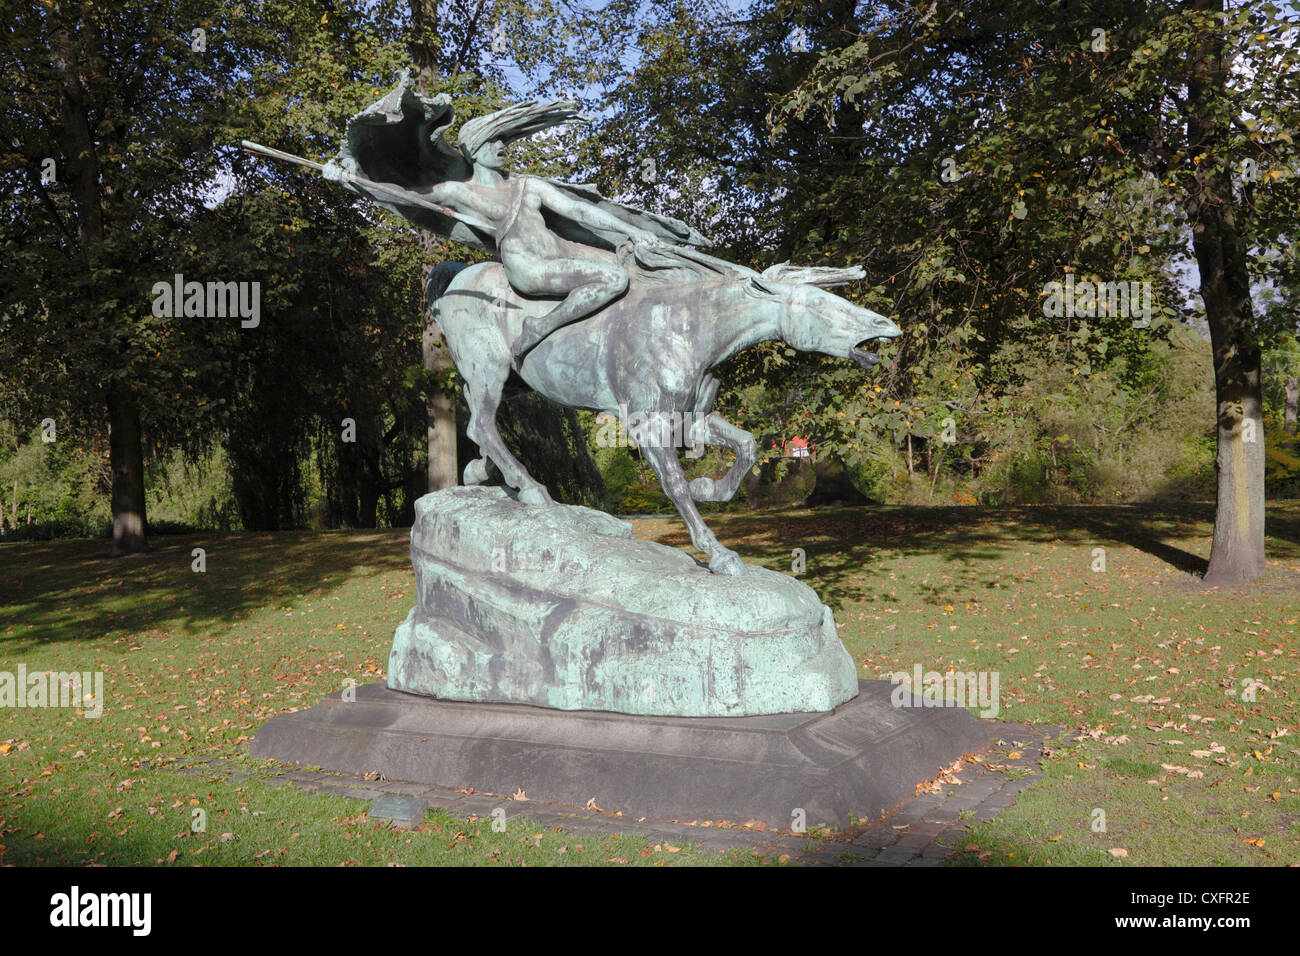 The Valkyrie bronze statue in Churchill Park at Groenningen in Copenhagen, Denmark. Female figure in Norse mythology. - Stock Image